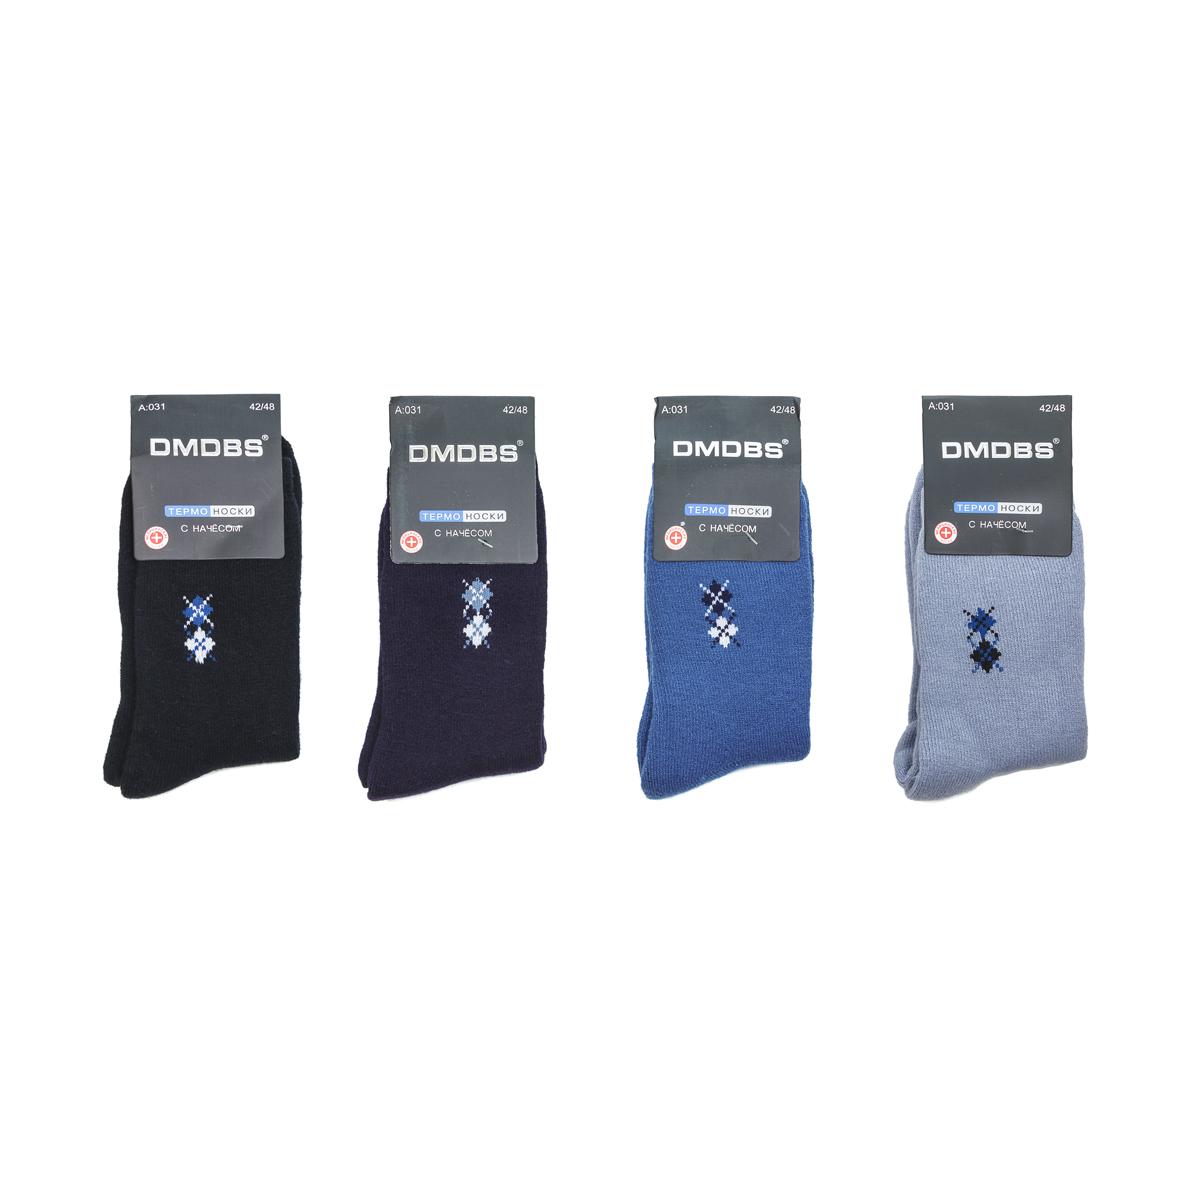 Муж. носки арт. 12-0014 Серый р. 42-48Носки<br><br><br>Тип: Муж. носки<br>Размер: 42-48<br>Материал: Трикотаж